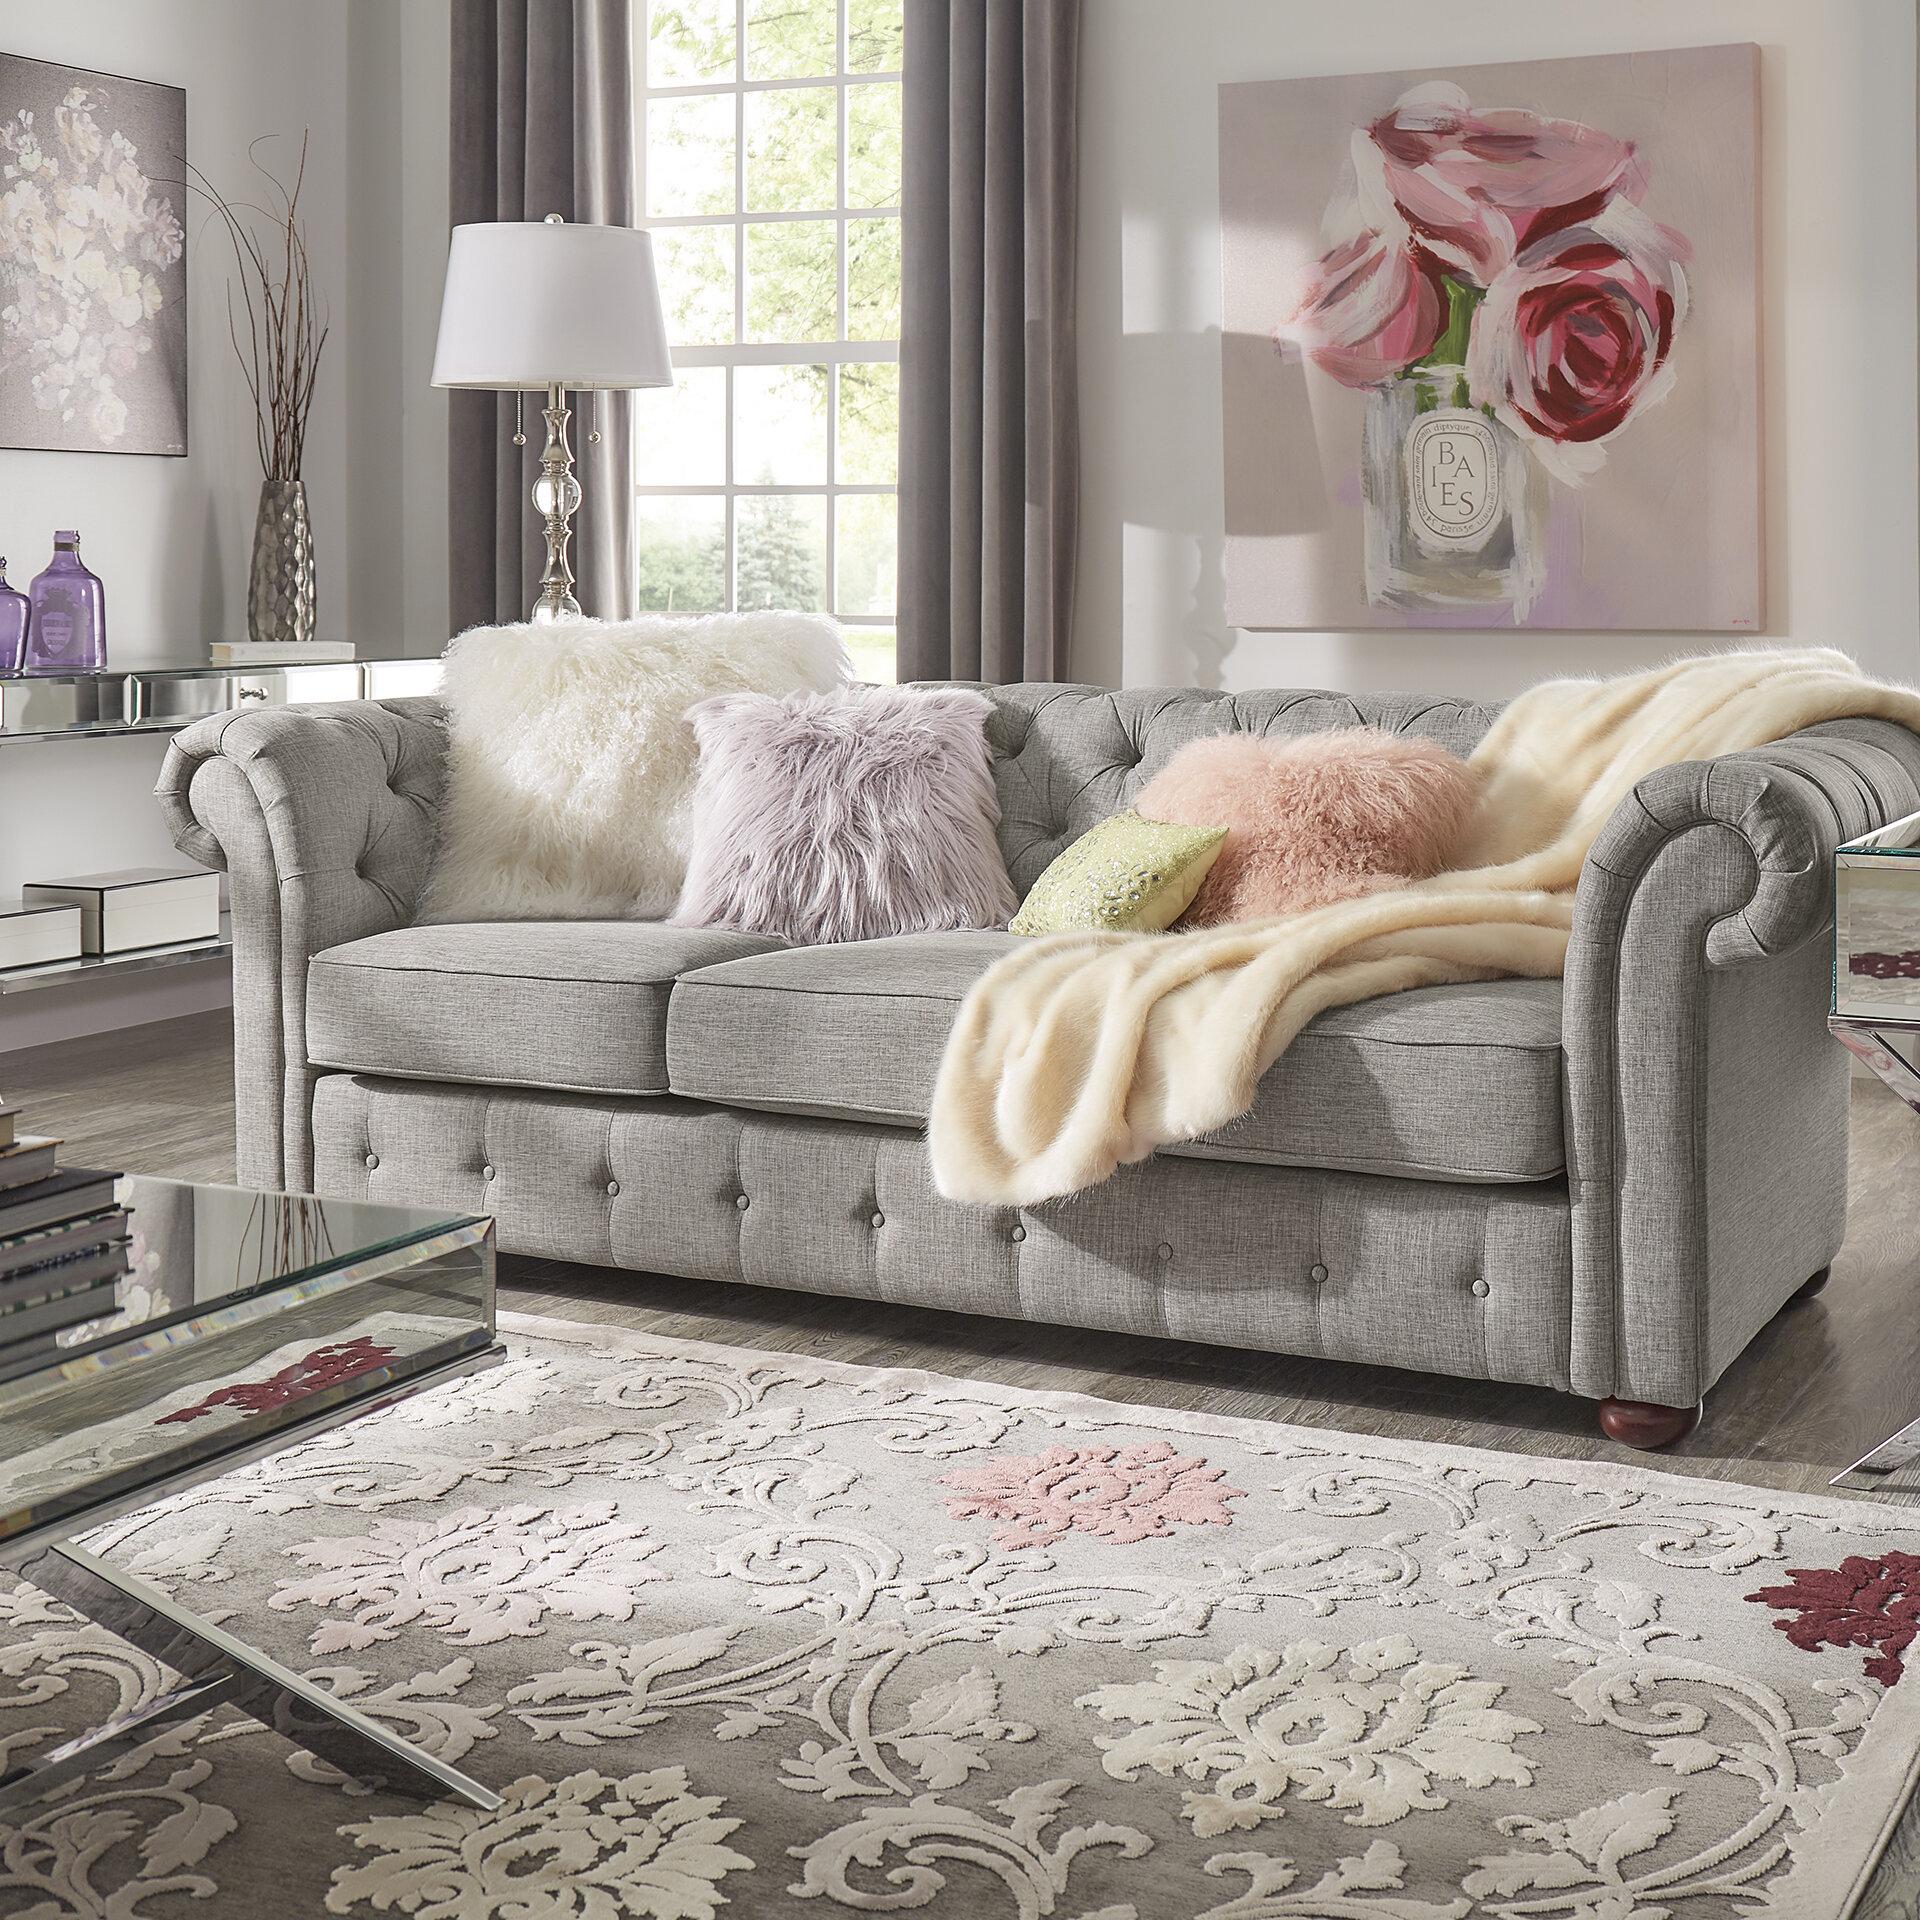 Willa Arlo Interiors Vegard Tufted Chesterfield Sofa U0026 Reviews | Wayfair